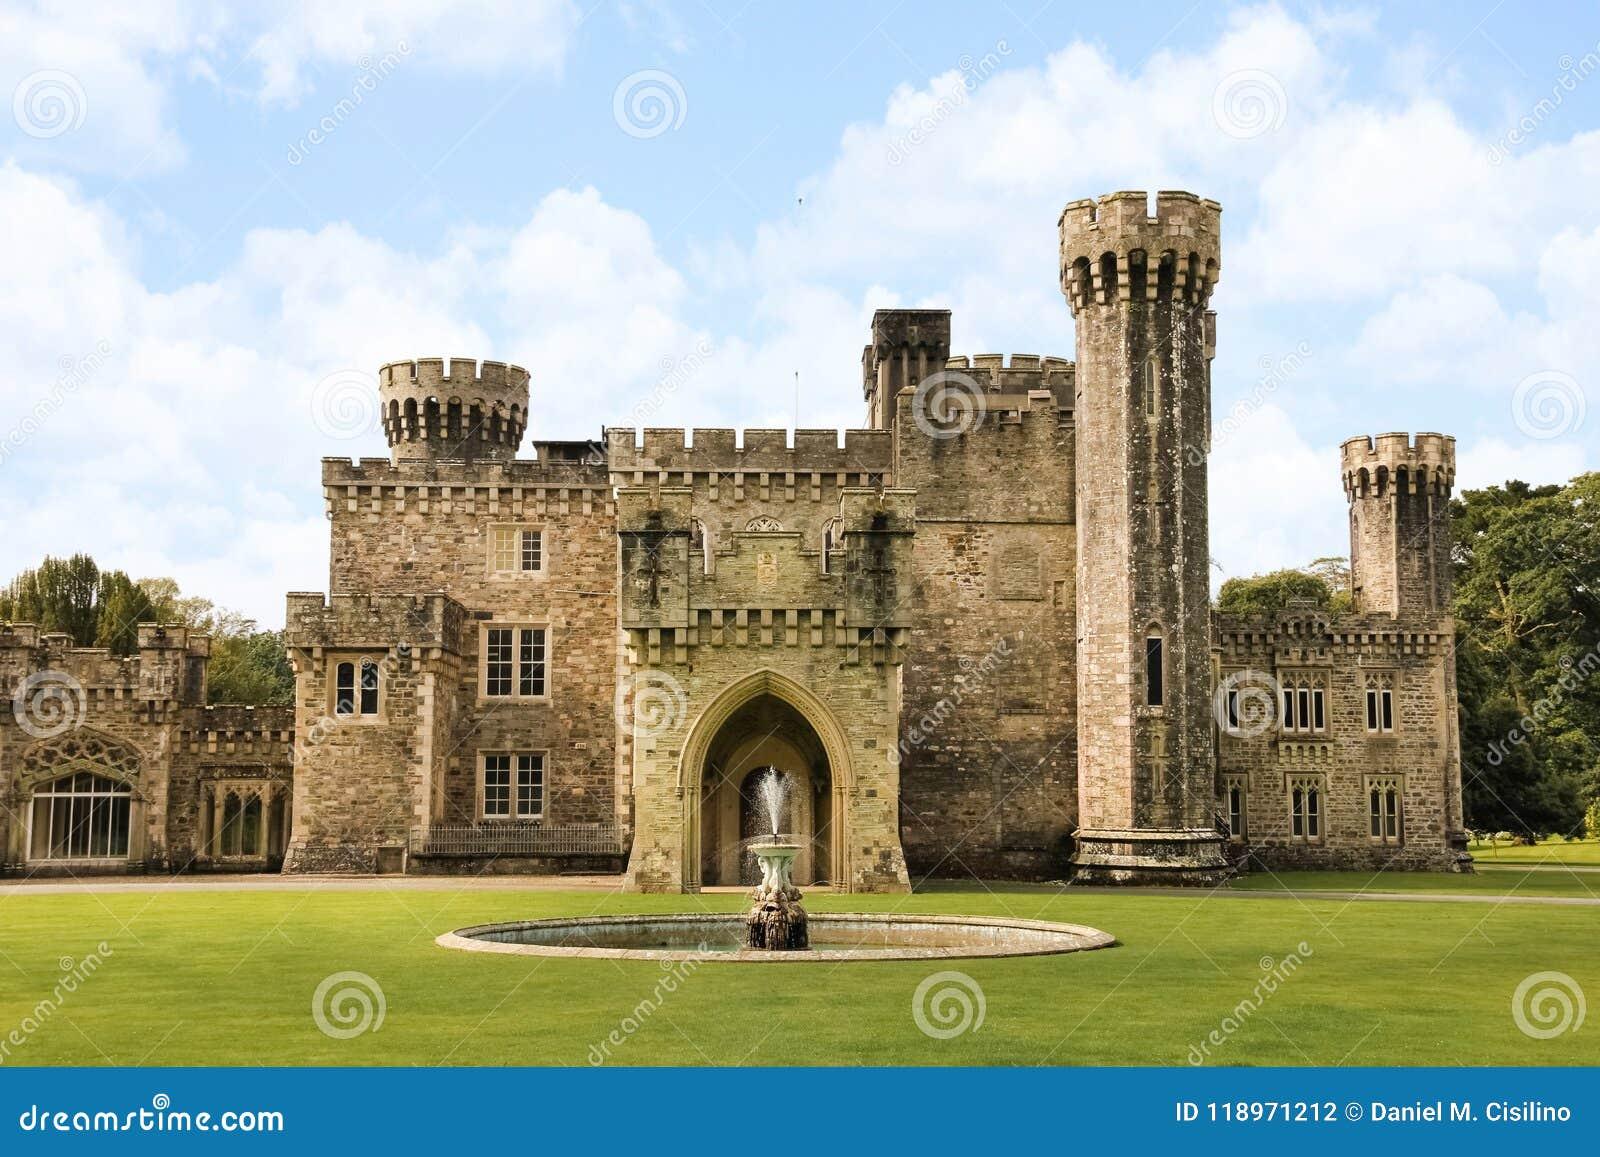 Замок Джонстаун графство Wexford Ирландия